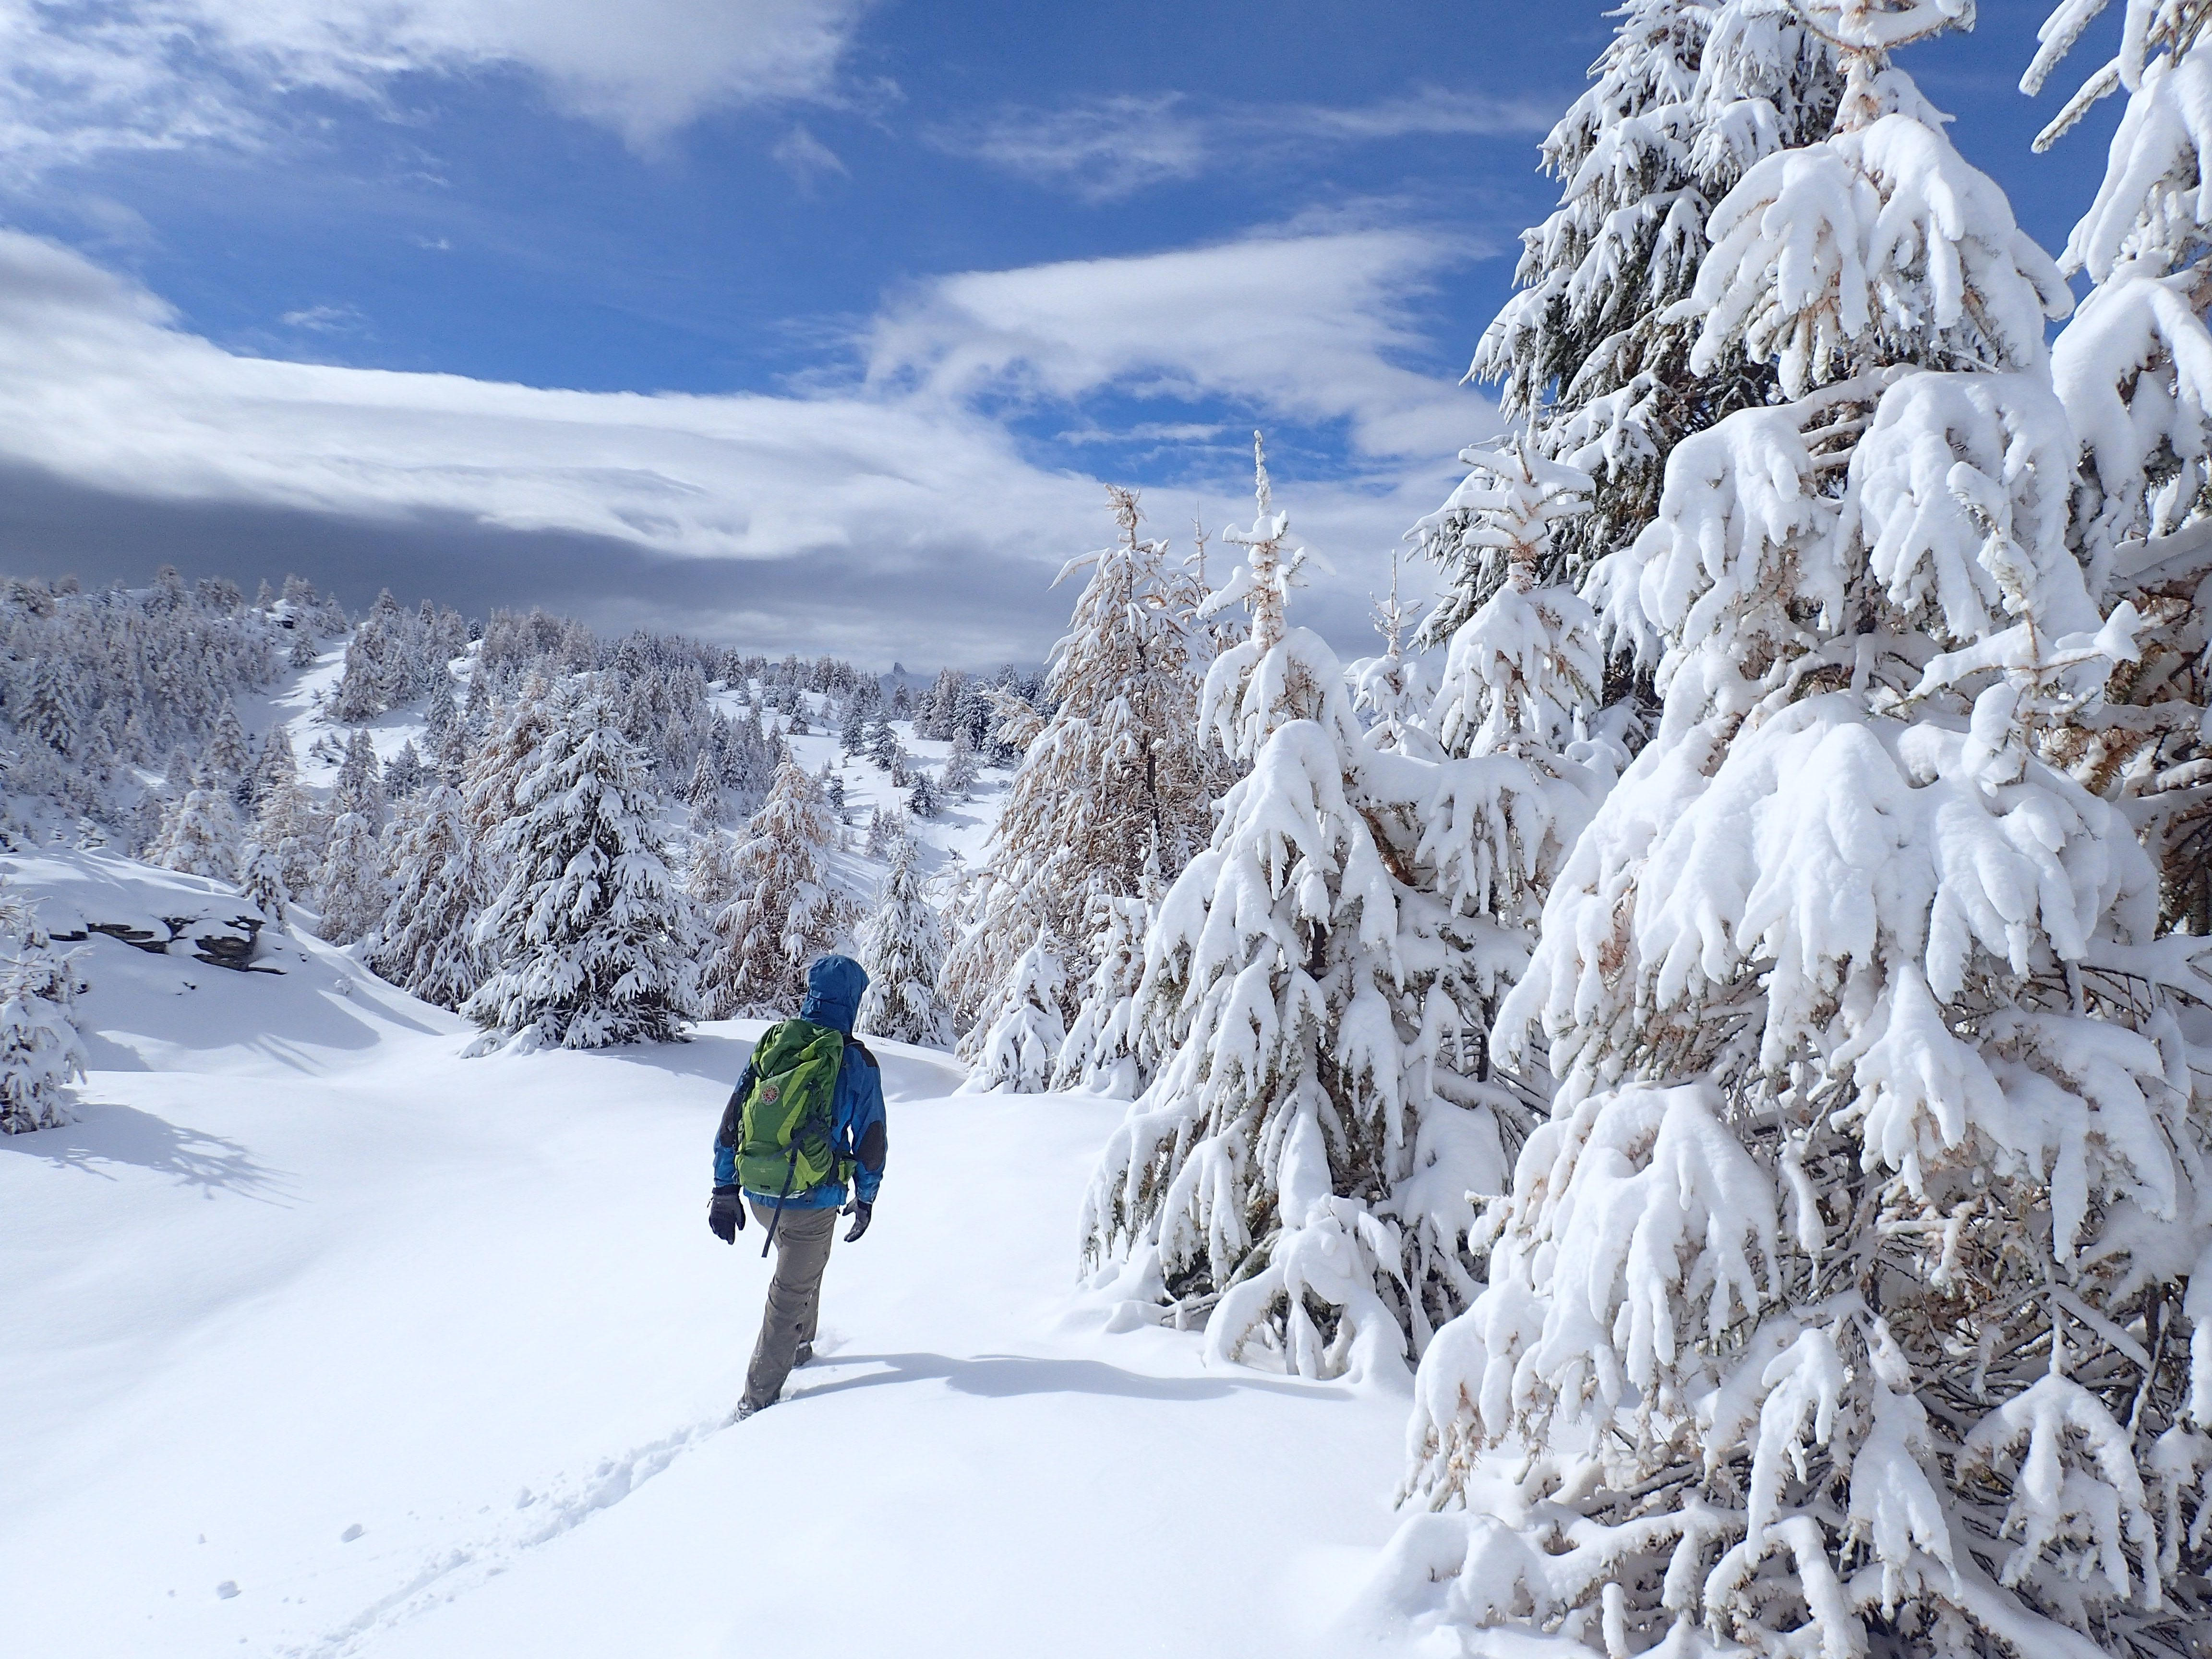 Bon Weekend Findelautomne Neige Premiereneige Snow Hiver Winter Mountains Destinationsqueyras Queyras Parcnaturelreg Queyras Randonneurs Randonnee